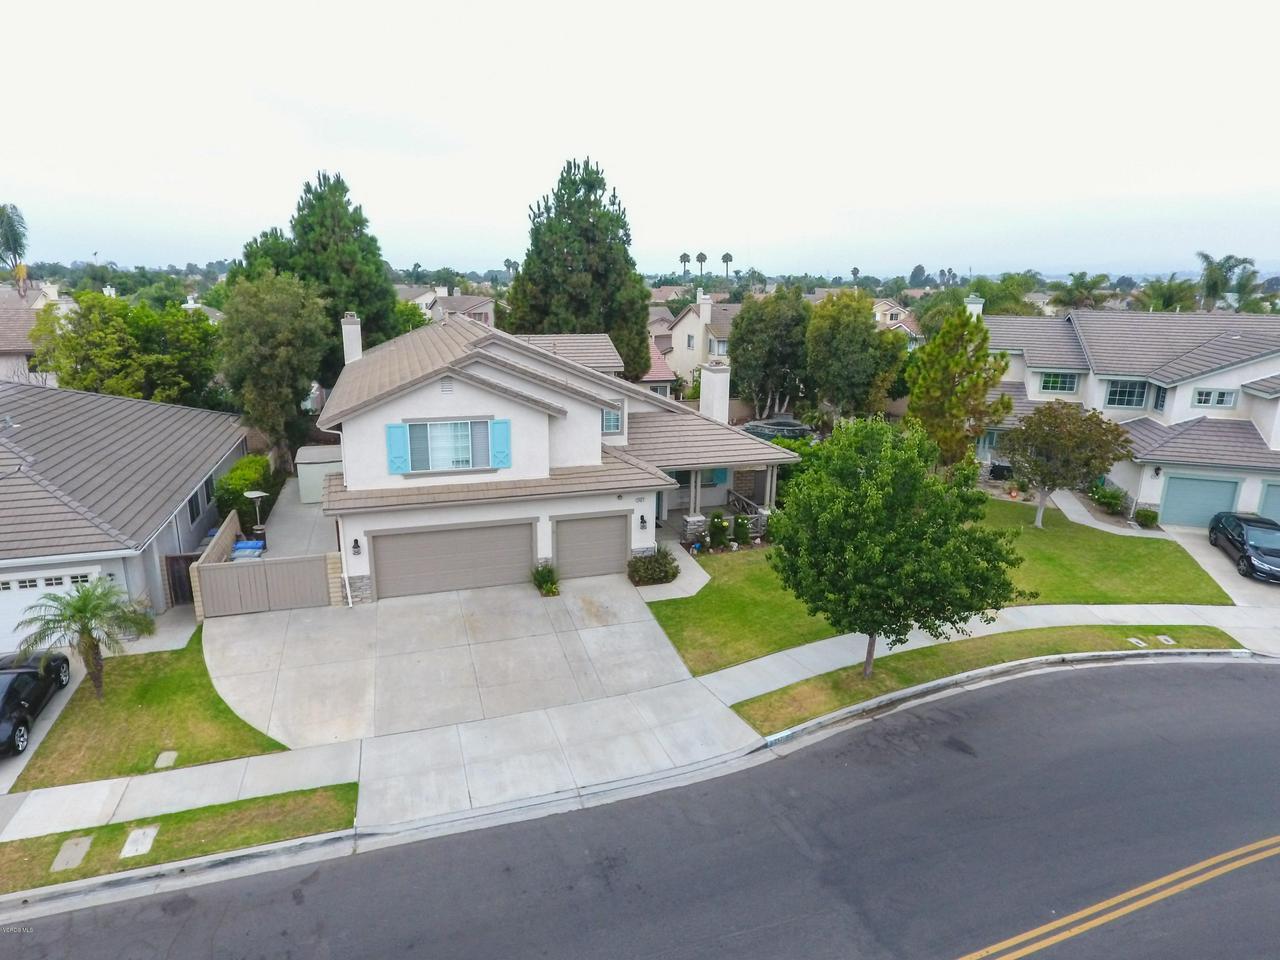 2421 KENTIA STREET, OXNARD, CA 93036